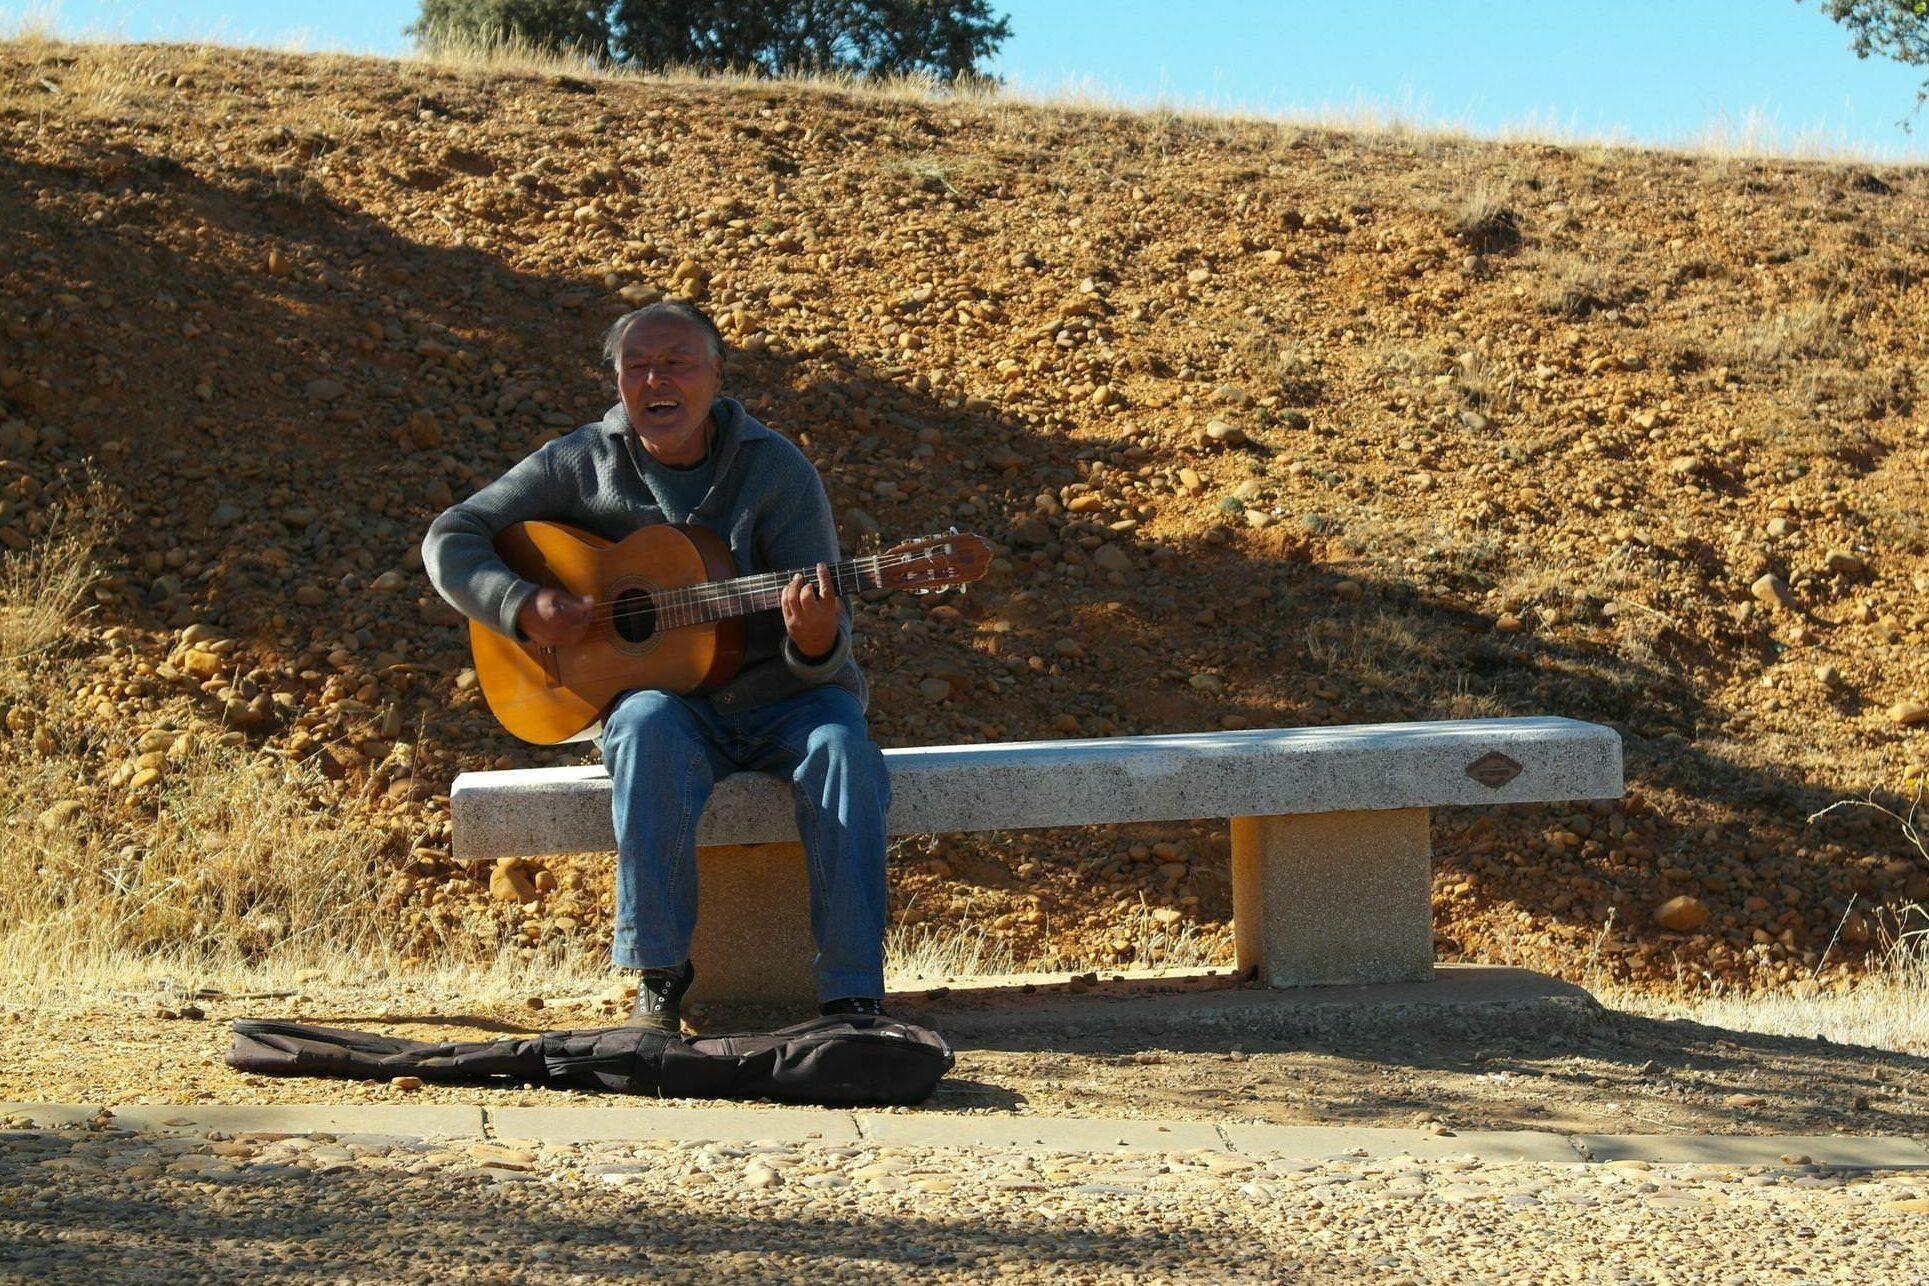 Spain camino de santiago guitar player astorga